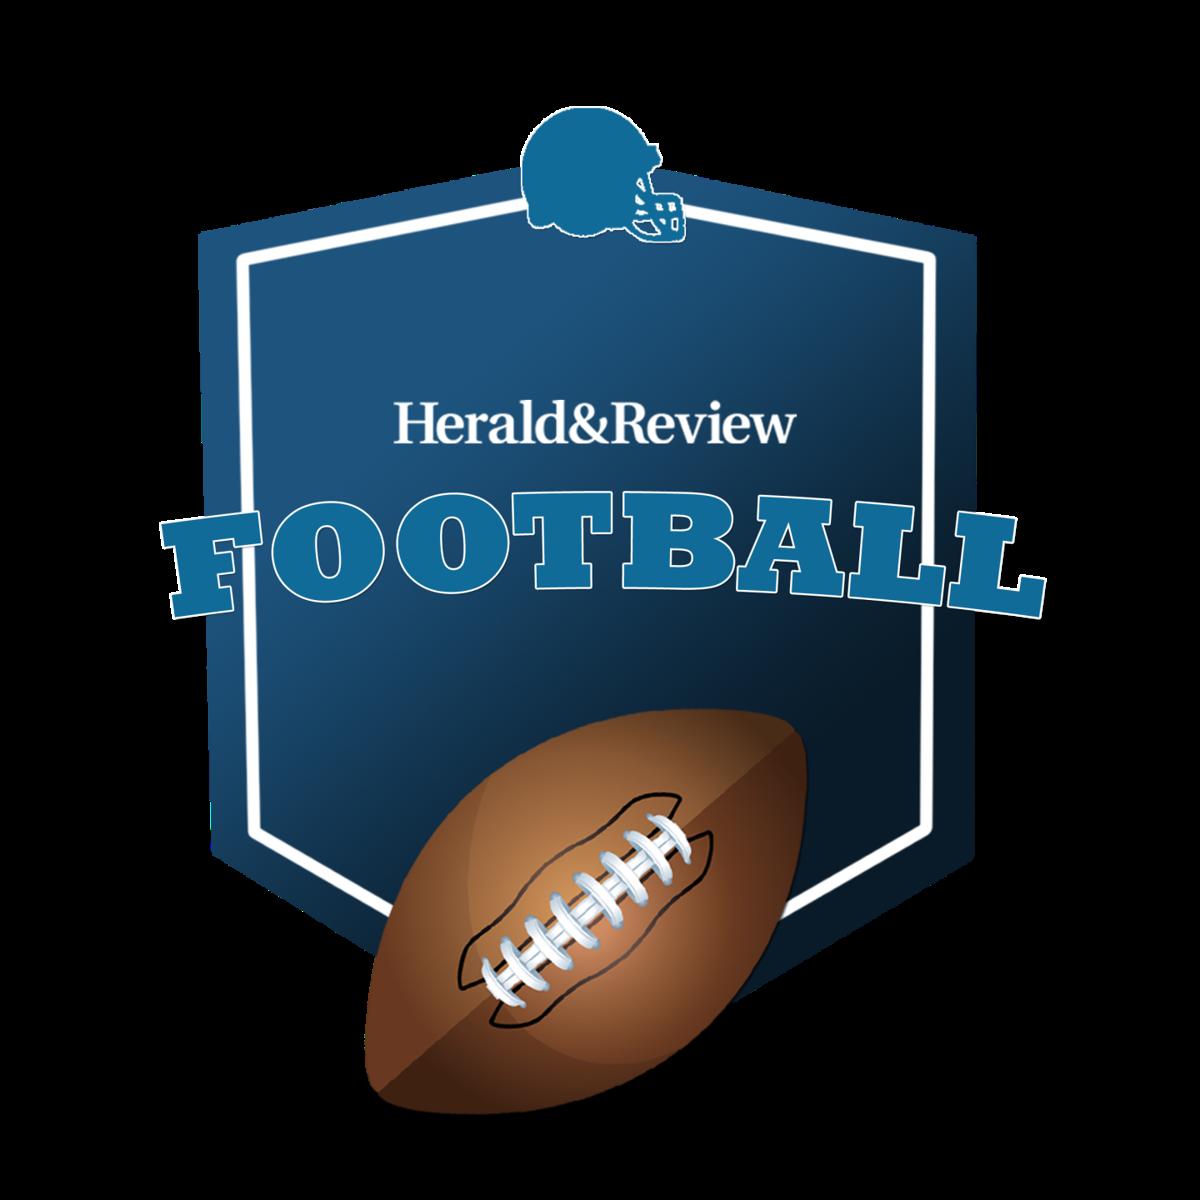 H&R football logo